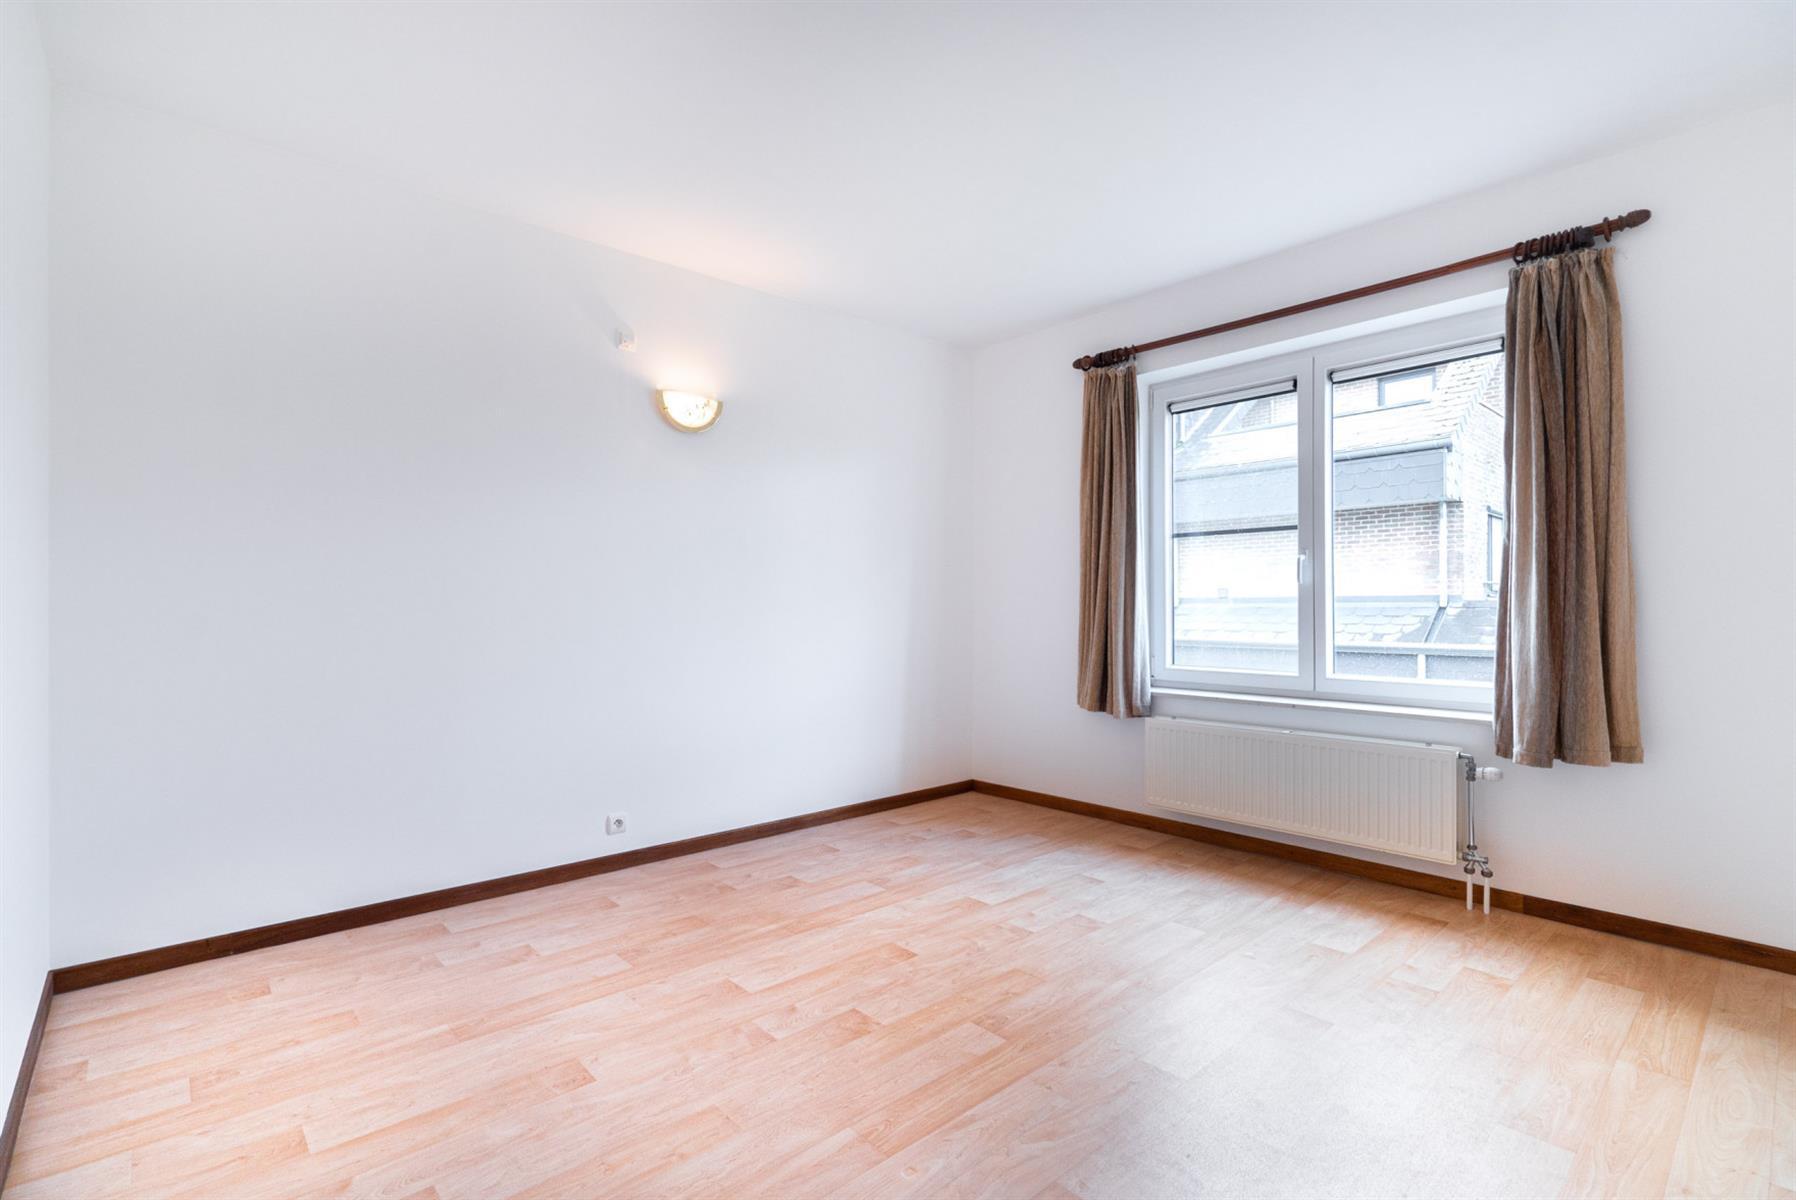 Appartement - Jalhay - #4305578-6